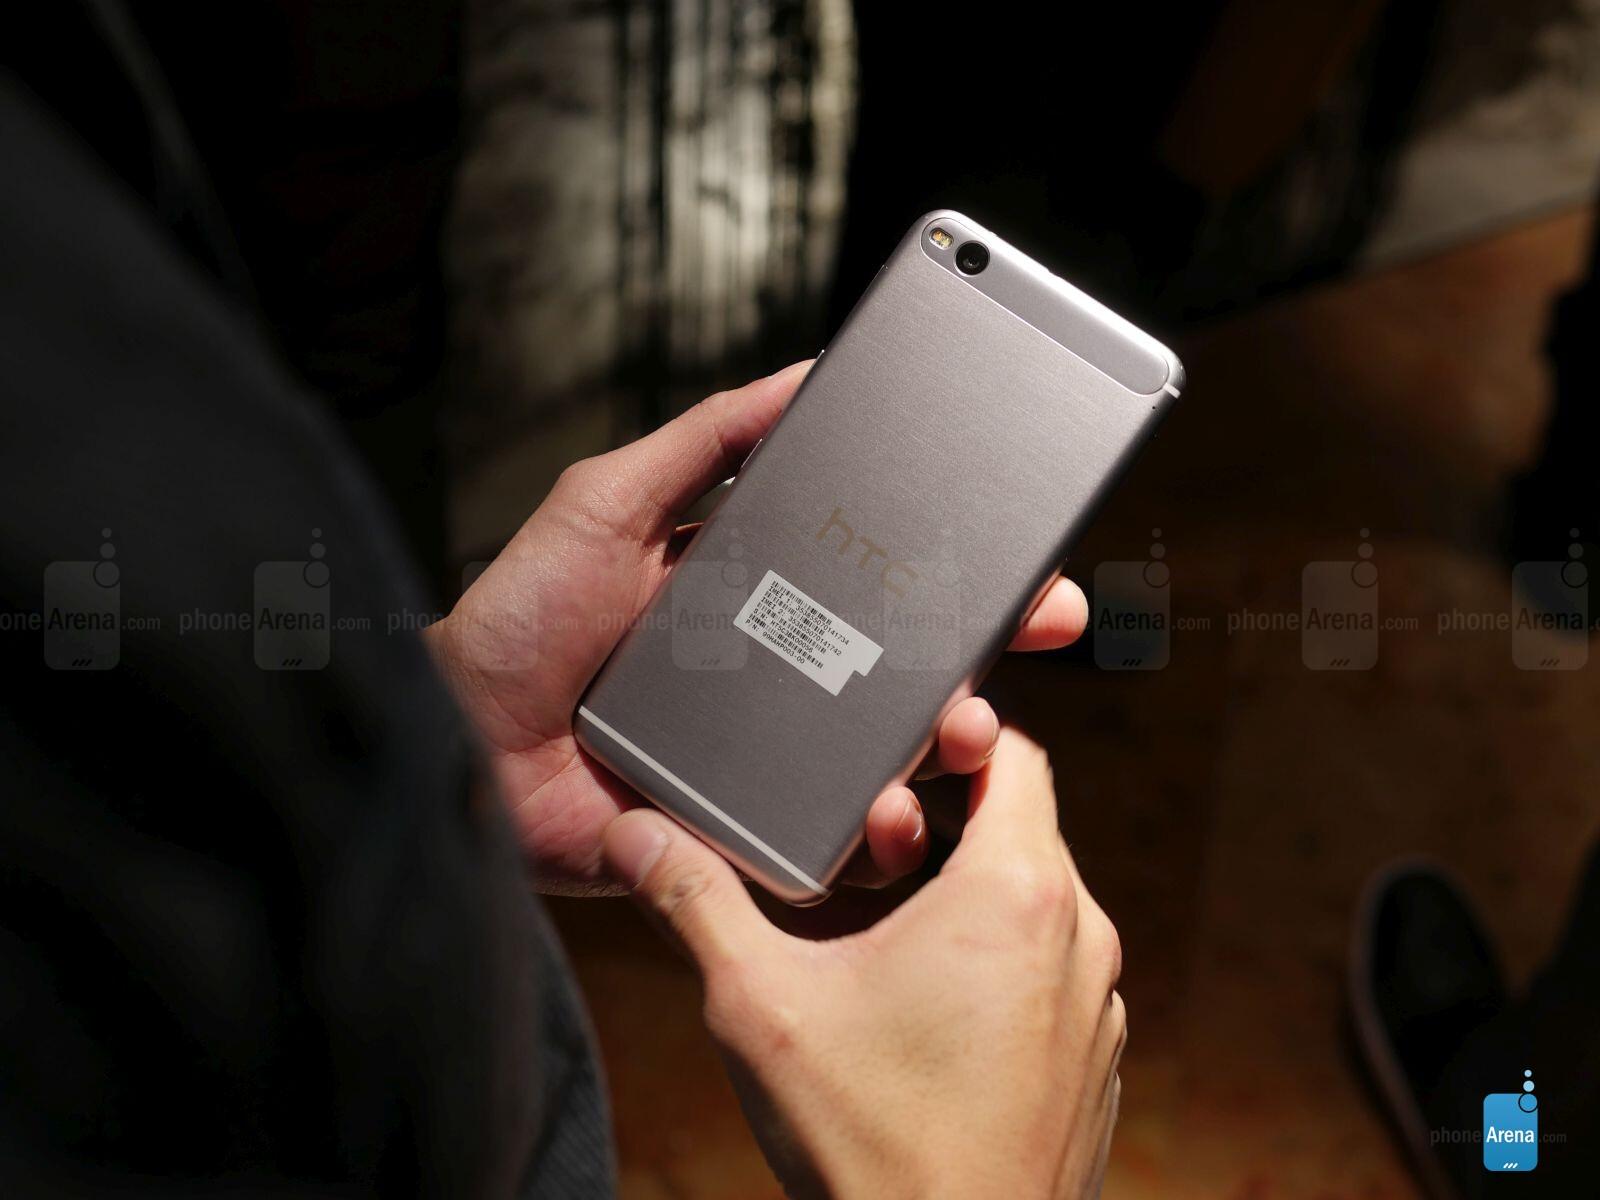 new concept b00b0 5bb8e HTC One X9 hands-on | PhoneArena reviews - PhoneArena